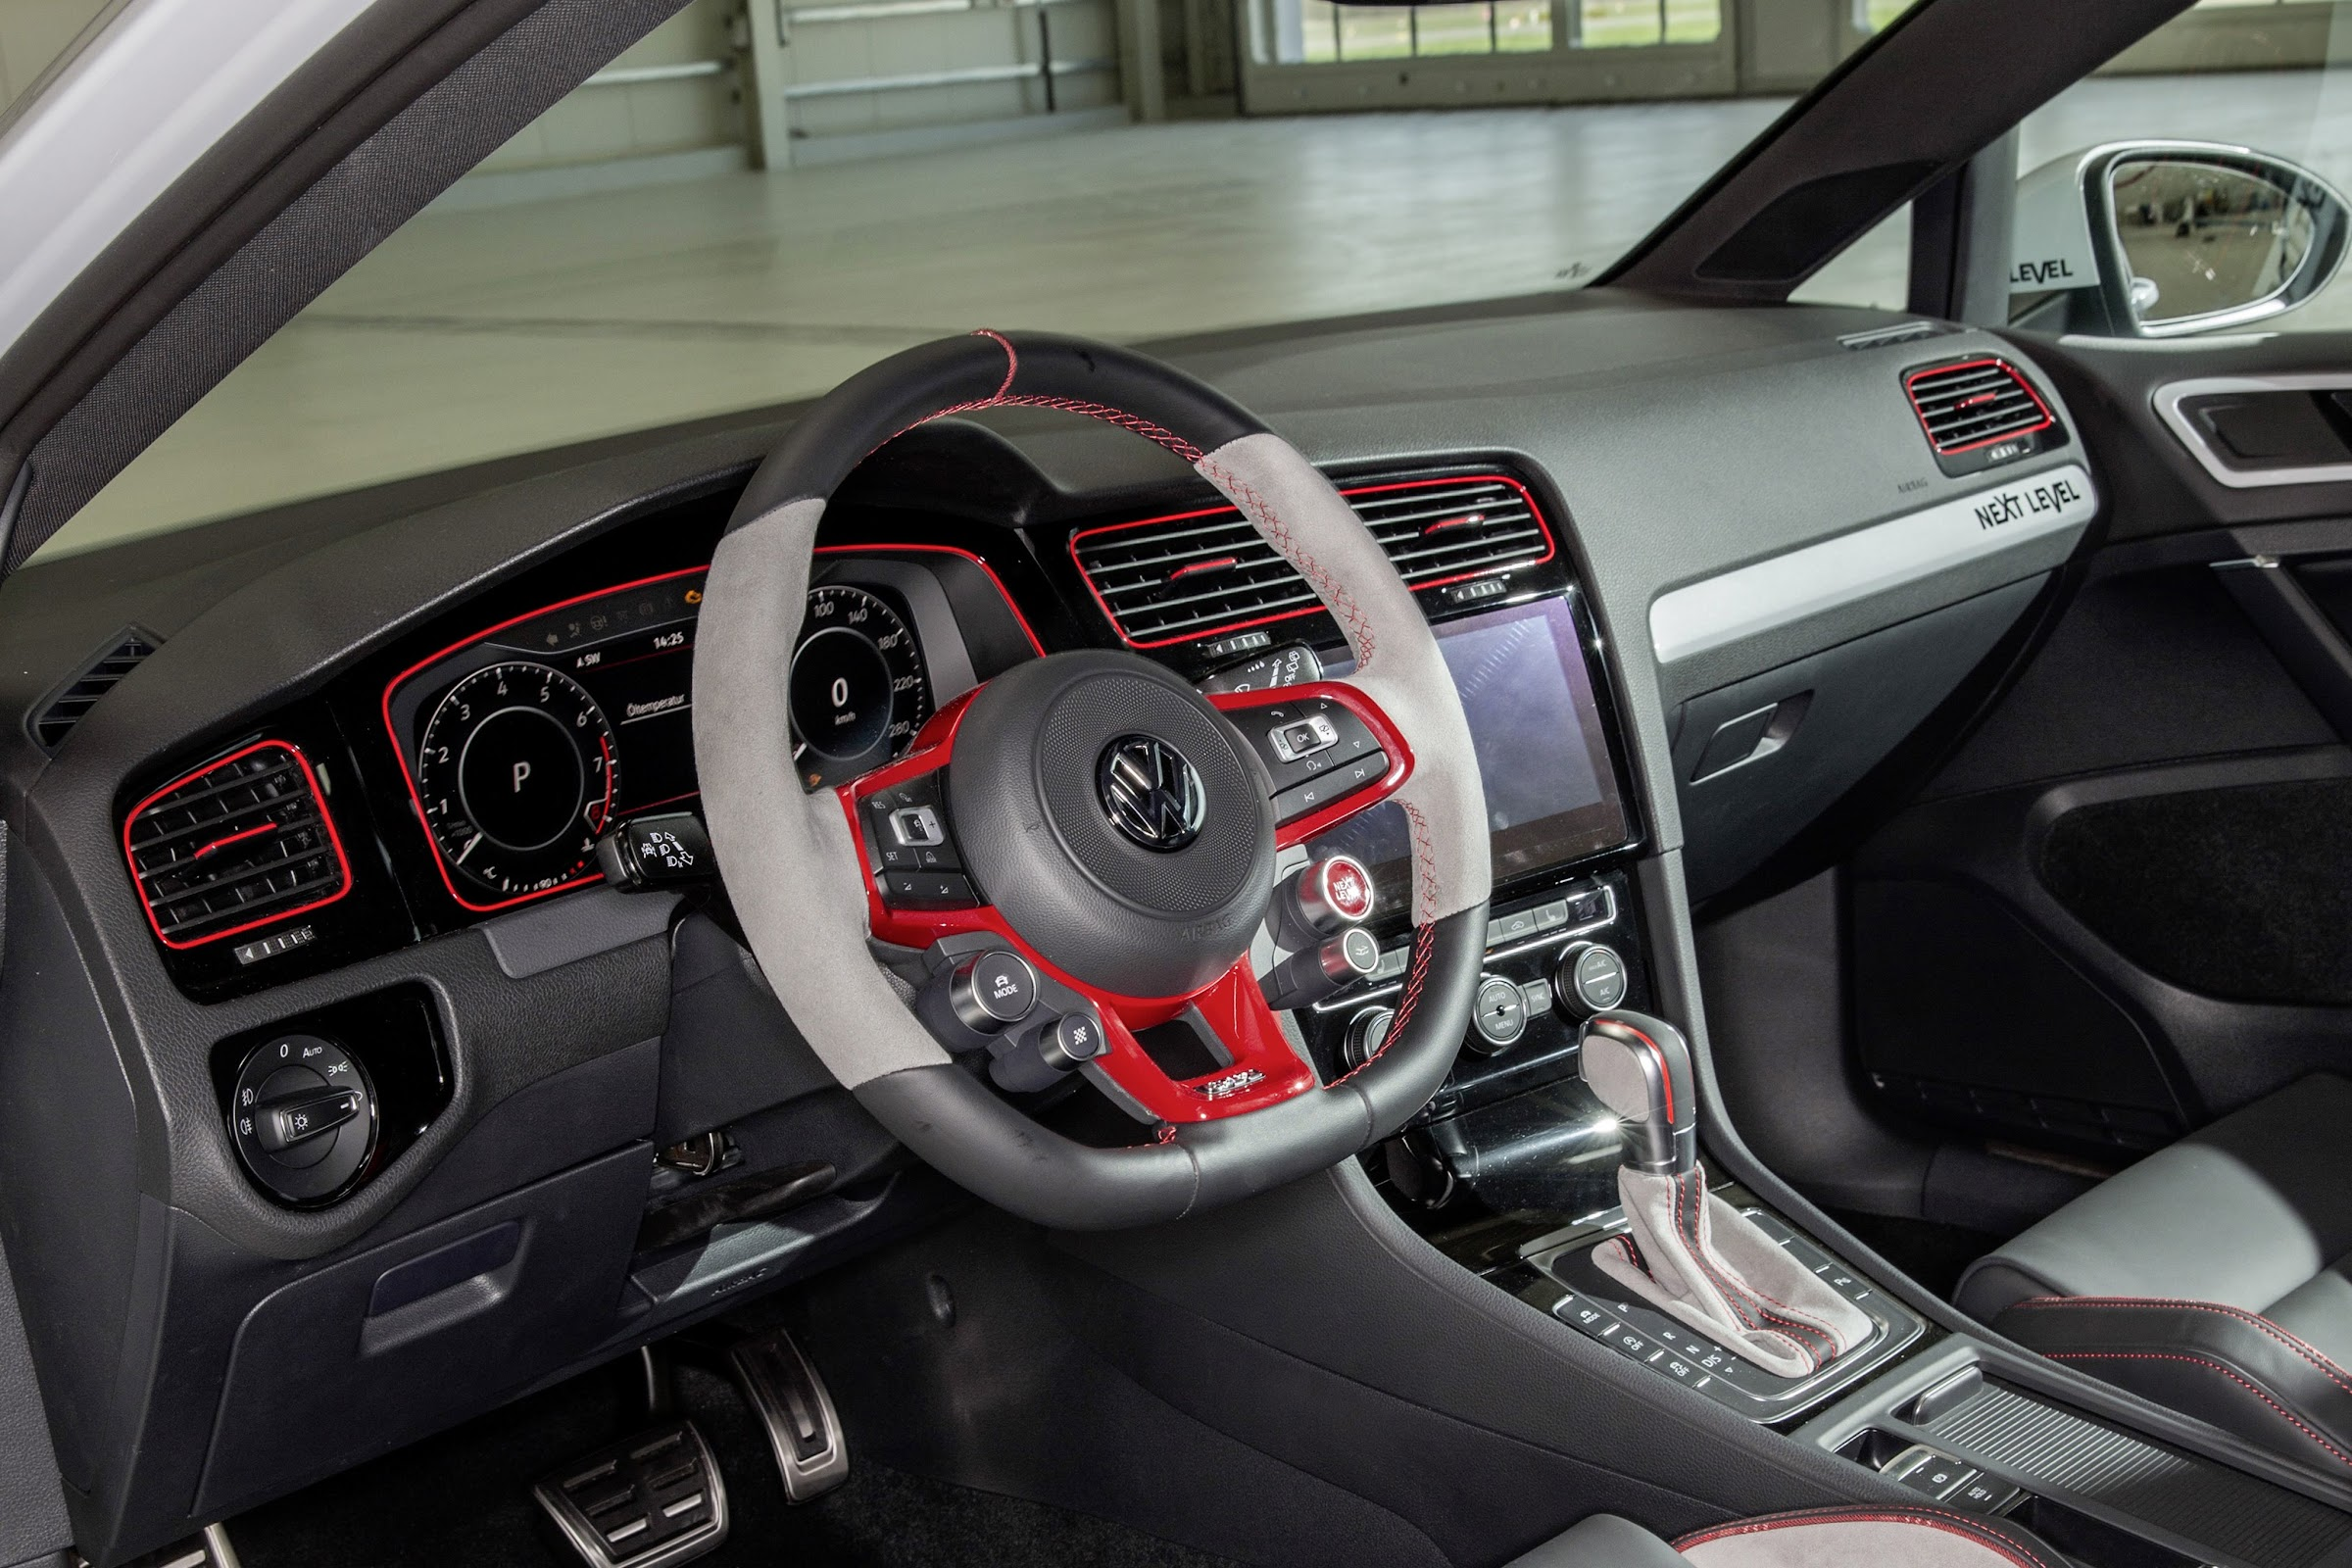 2 Lyr7VCCze4t1VAjwOba5dh8wrs3vyVKoxwyUPtPID 5bhf381lbF7HHNGt1K5h90JBiS00vlyQ5wDKCv9iq7rWgxDSXT5XhdTvuKgT0gFCu7El0JAIOj 1htPTc2ZK8LO6OC8Jmw=w2400 - Los aprendices de Volkswagen preparan dos Golf GTI para cita del Lago Wörthersee